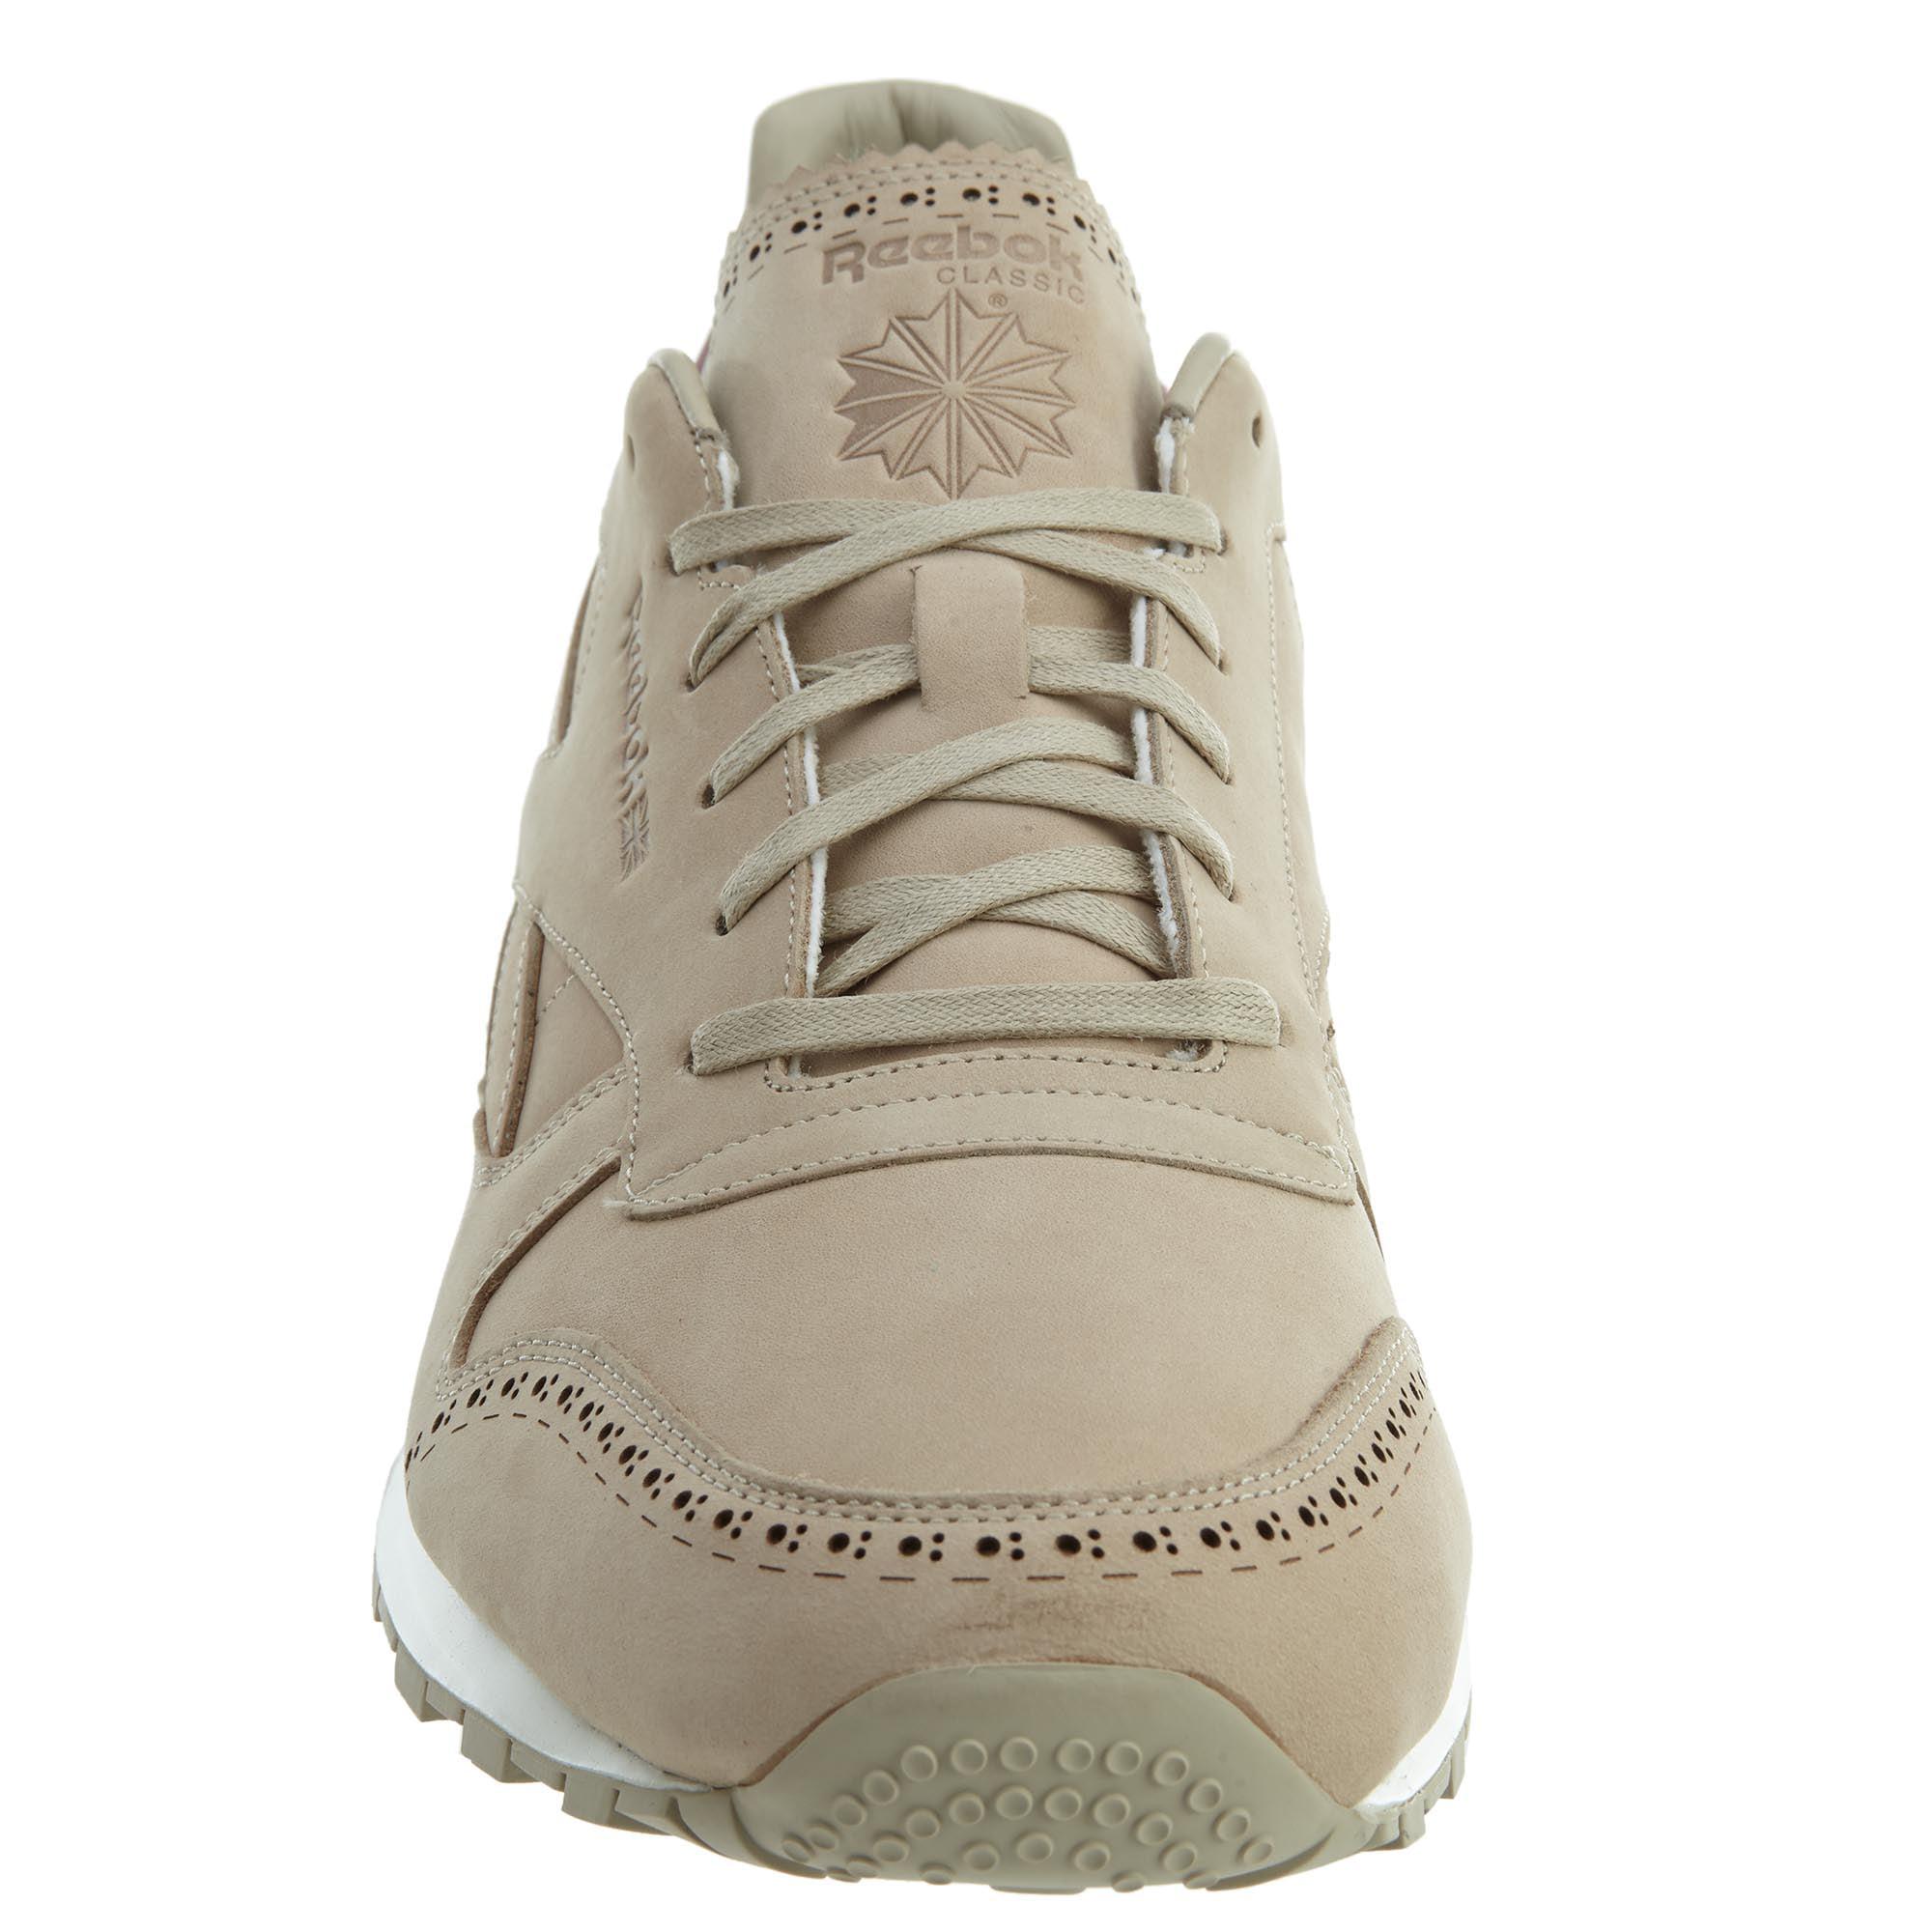 2a1cf77ec3390 Reebok - Reebok Cl Leather Lux Horween Mens Style   Aq9963 - Walmart.com